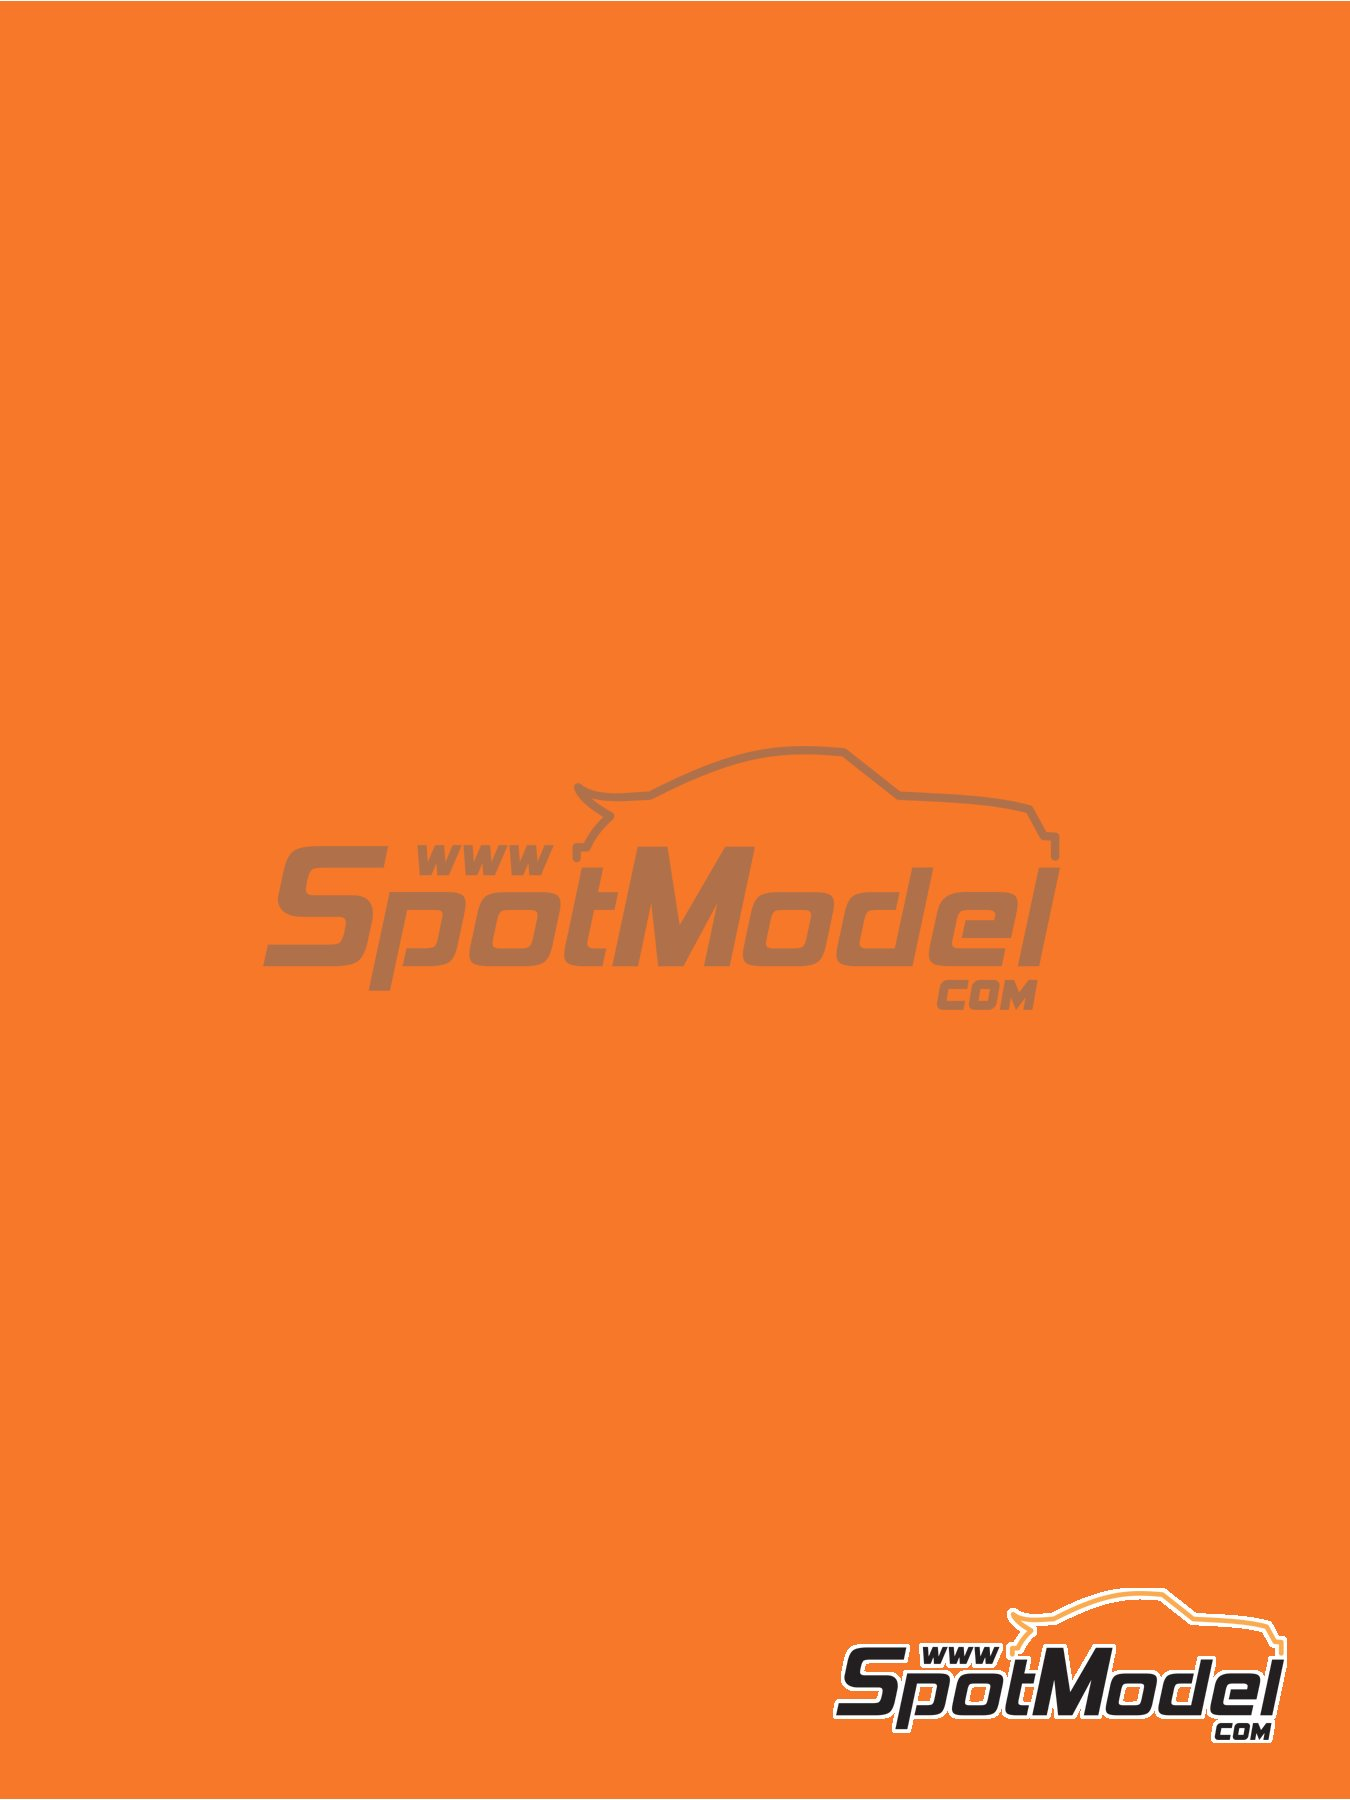 Naranja pálido - RAL2003 - Pastelorange - 1 x 60ml | Pintura fabricado por Zero Paints (ref.ZP-1033-RAL2003) image